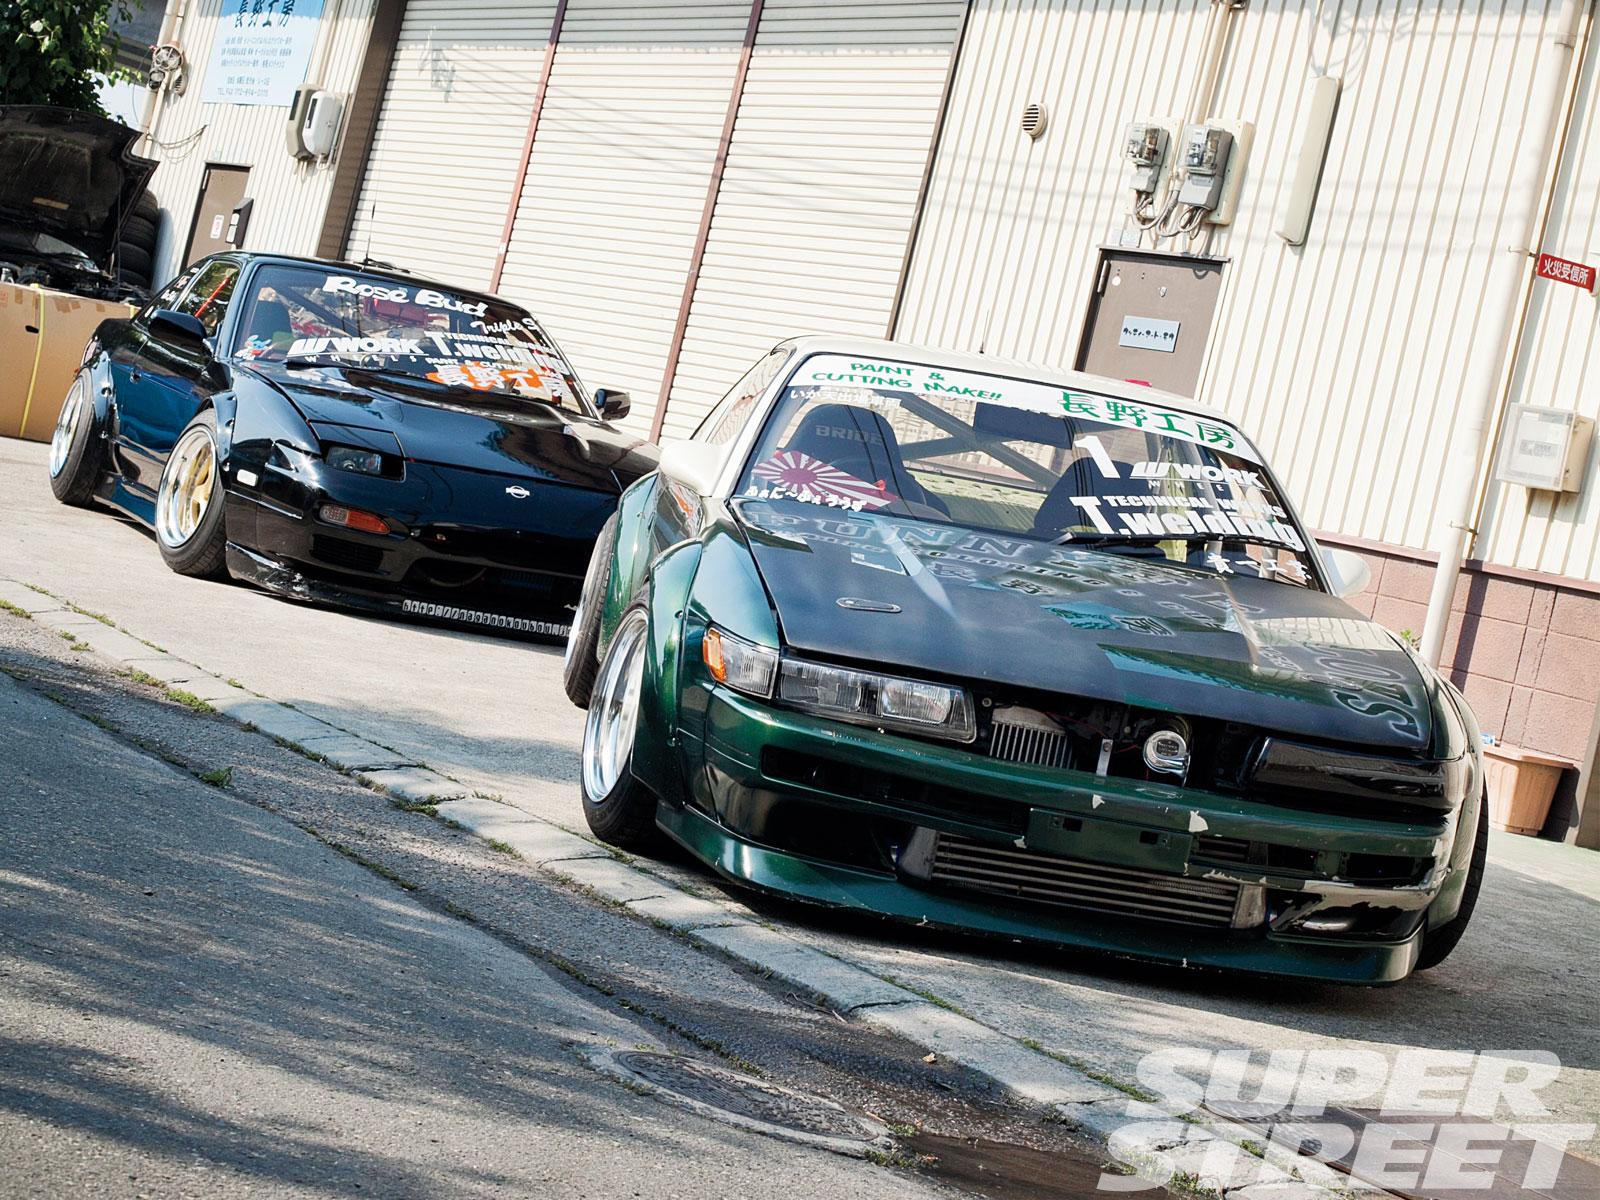 1988 Nissan Silvia S13 And 1990 Nissan Silvia Onevia S13 Double Your Pleasure Super Street Magazine